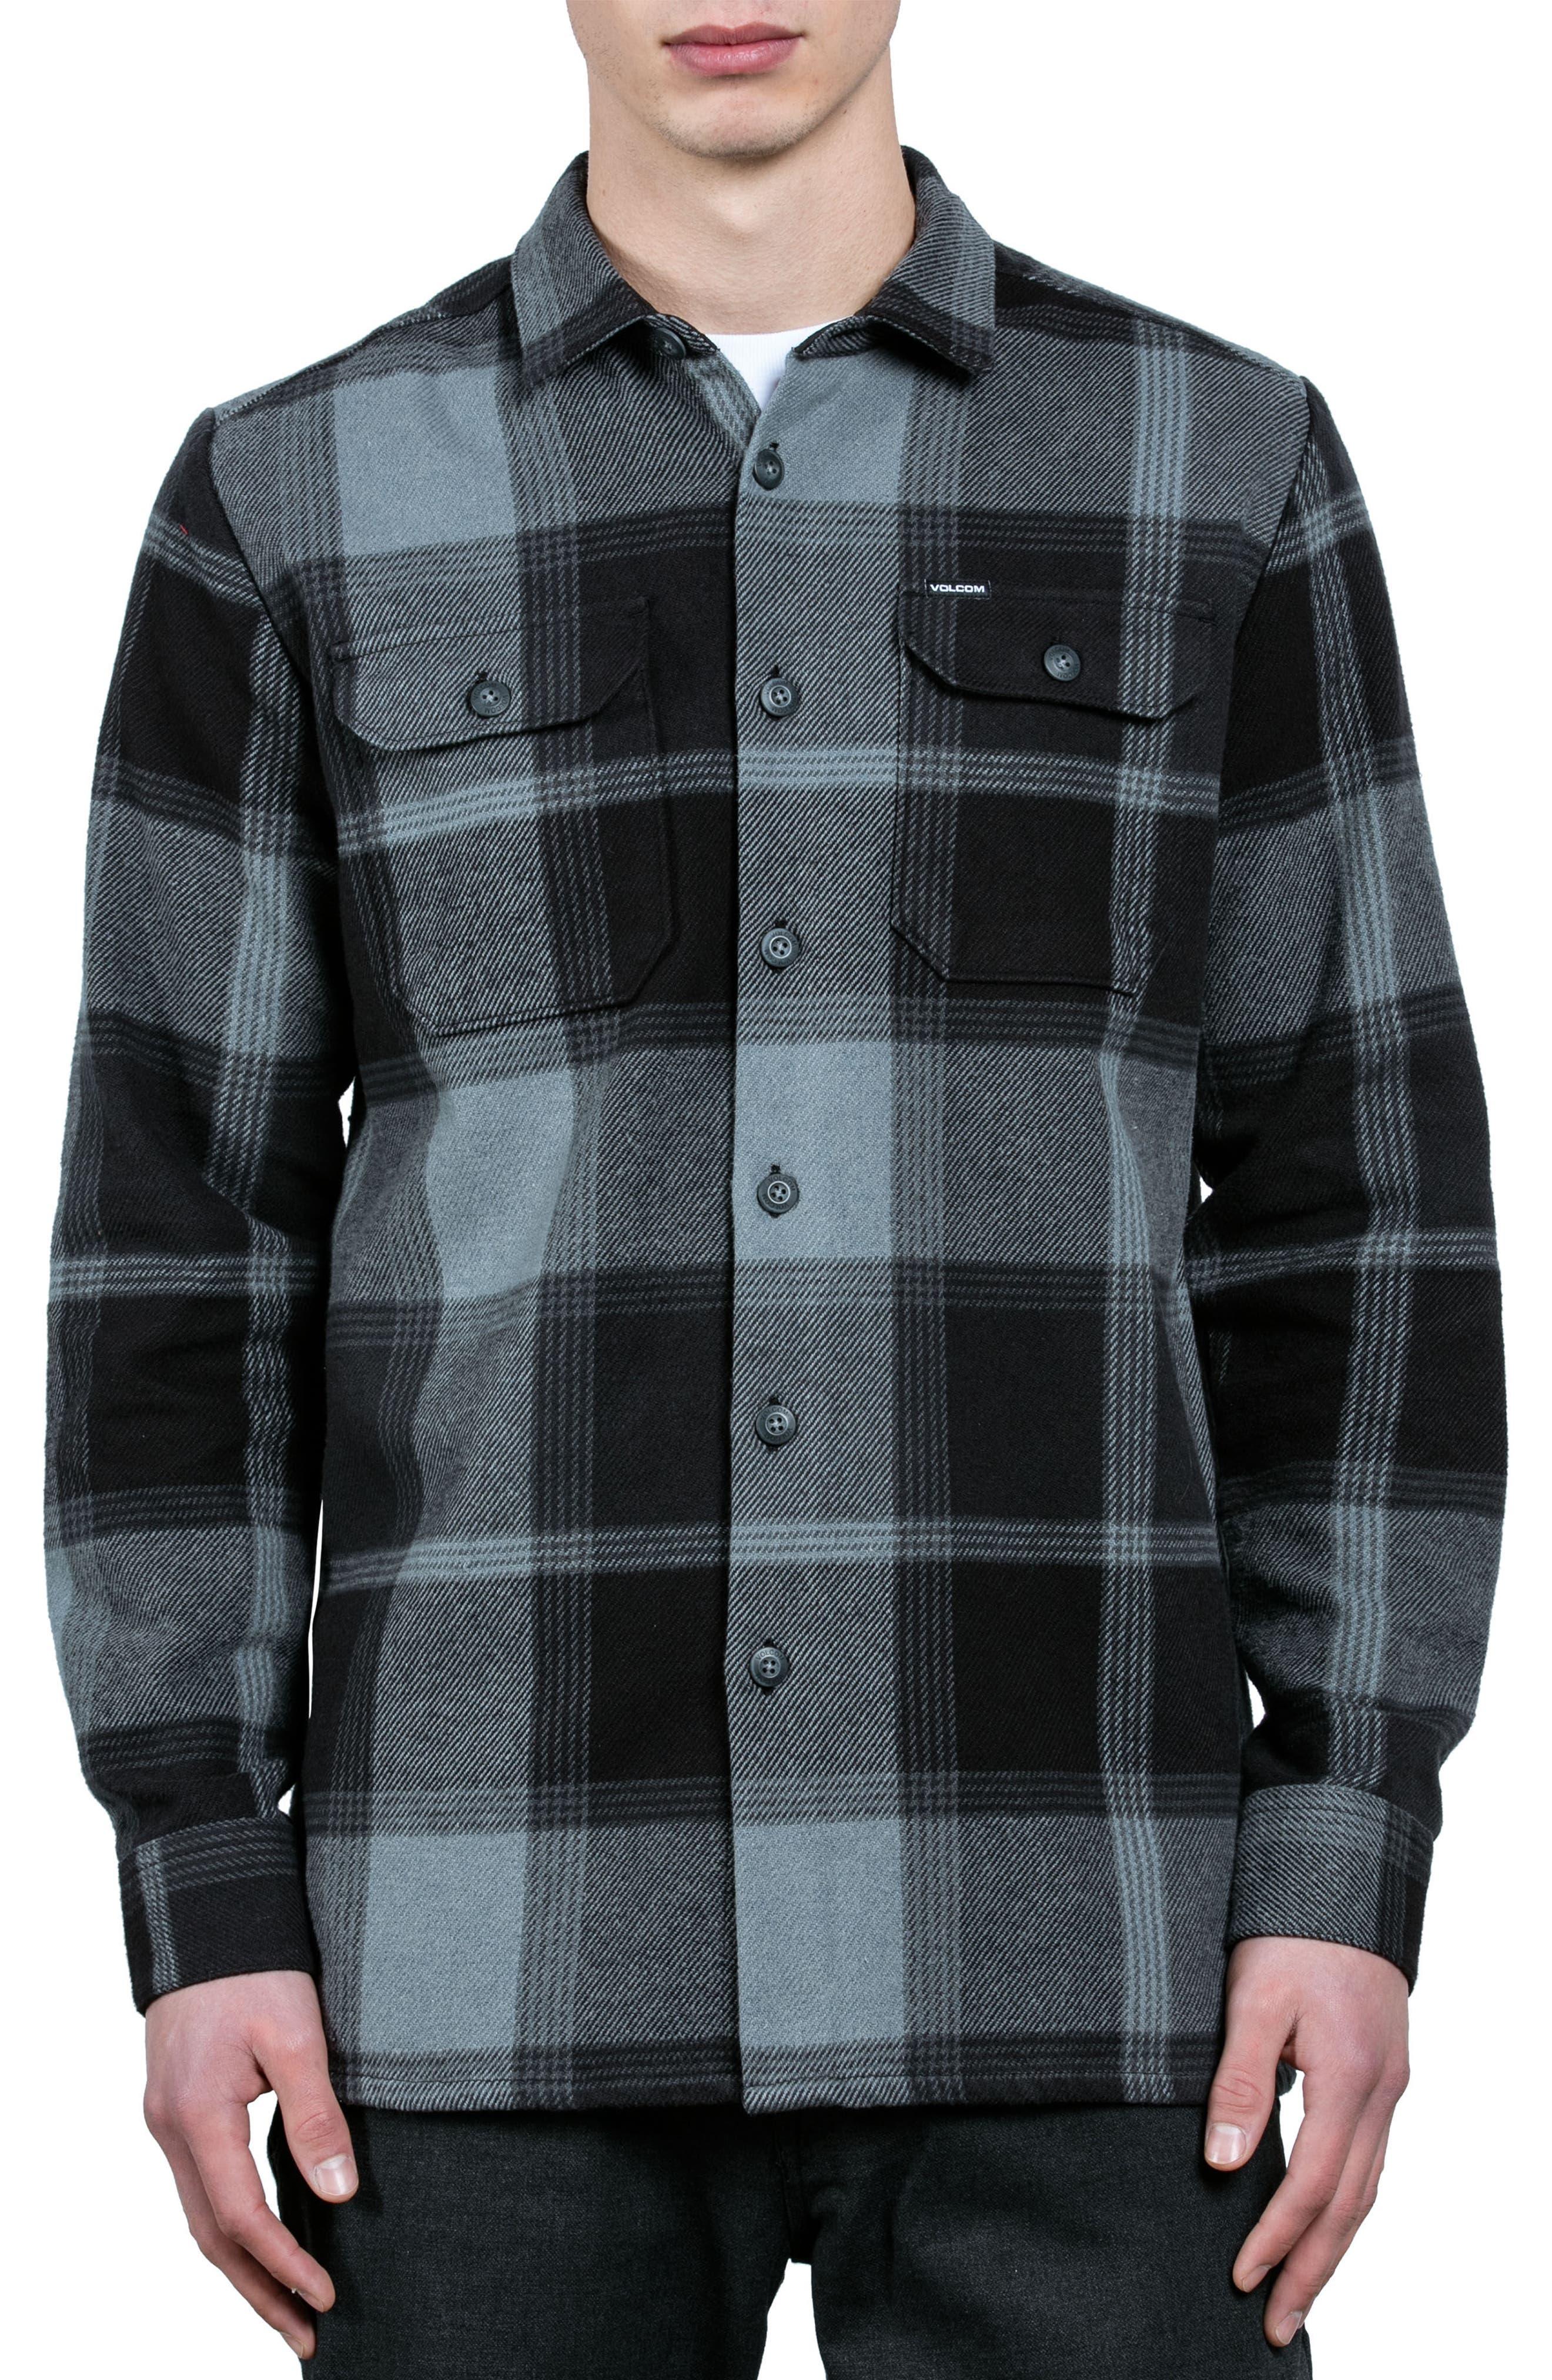 Alternate Image 1 Selected - Volcom Heavy Daze Plaid Flannel Shirt Jacket